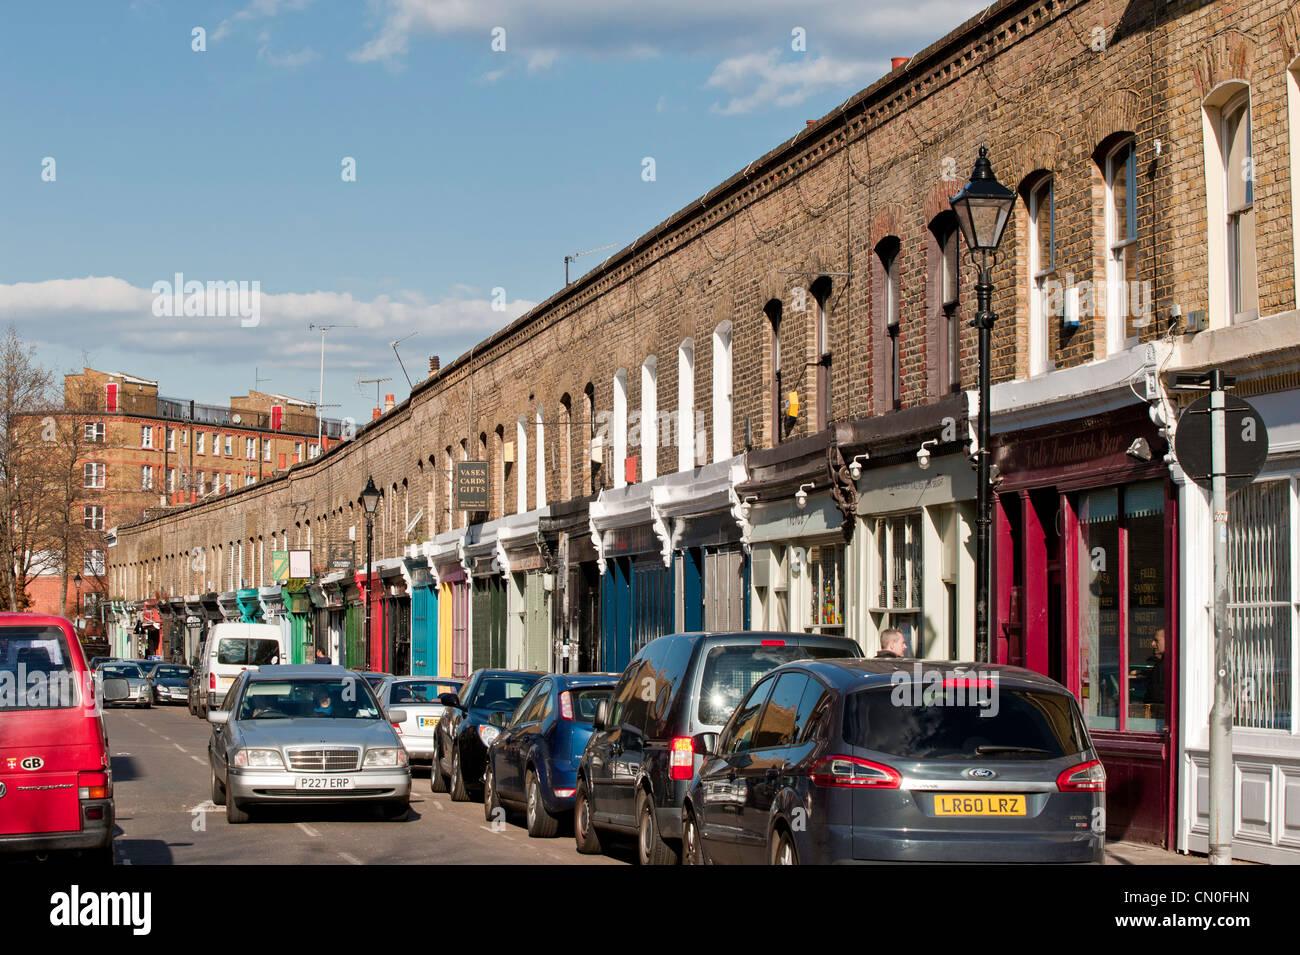 Shops on Columbia Road, London, United Kingdom - Stock Image